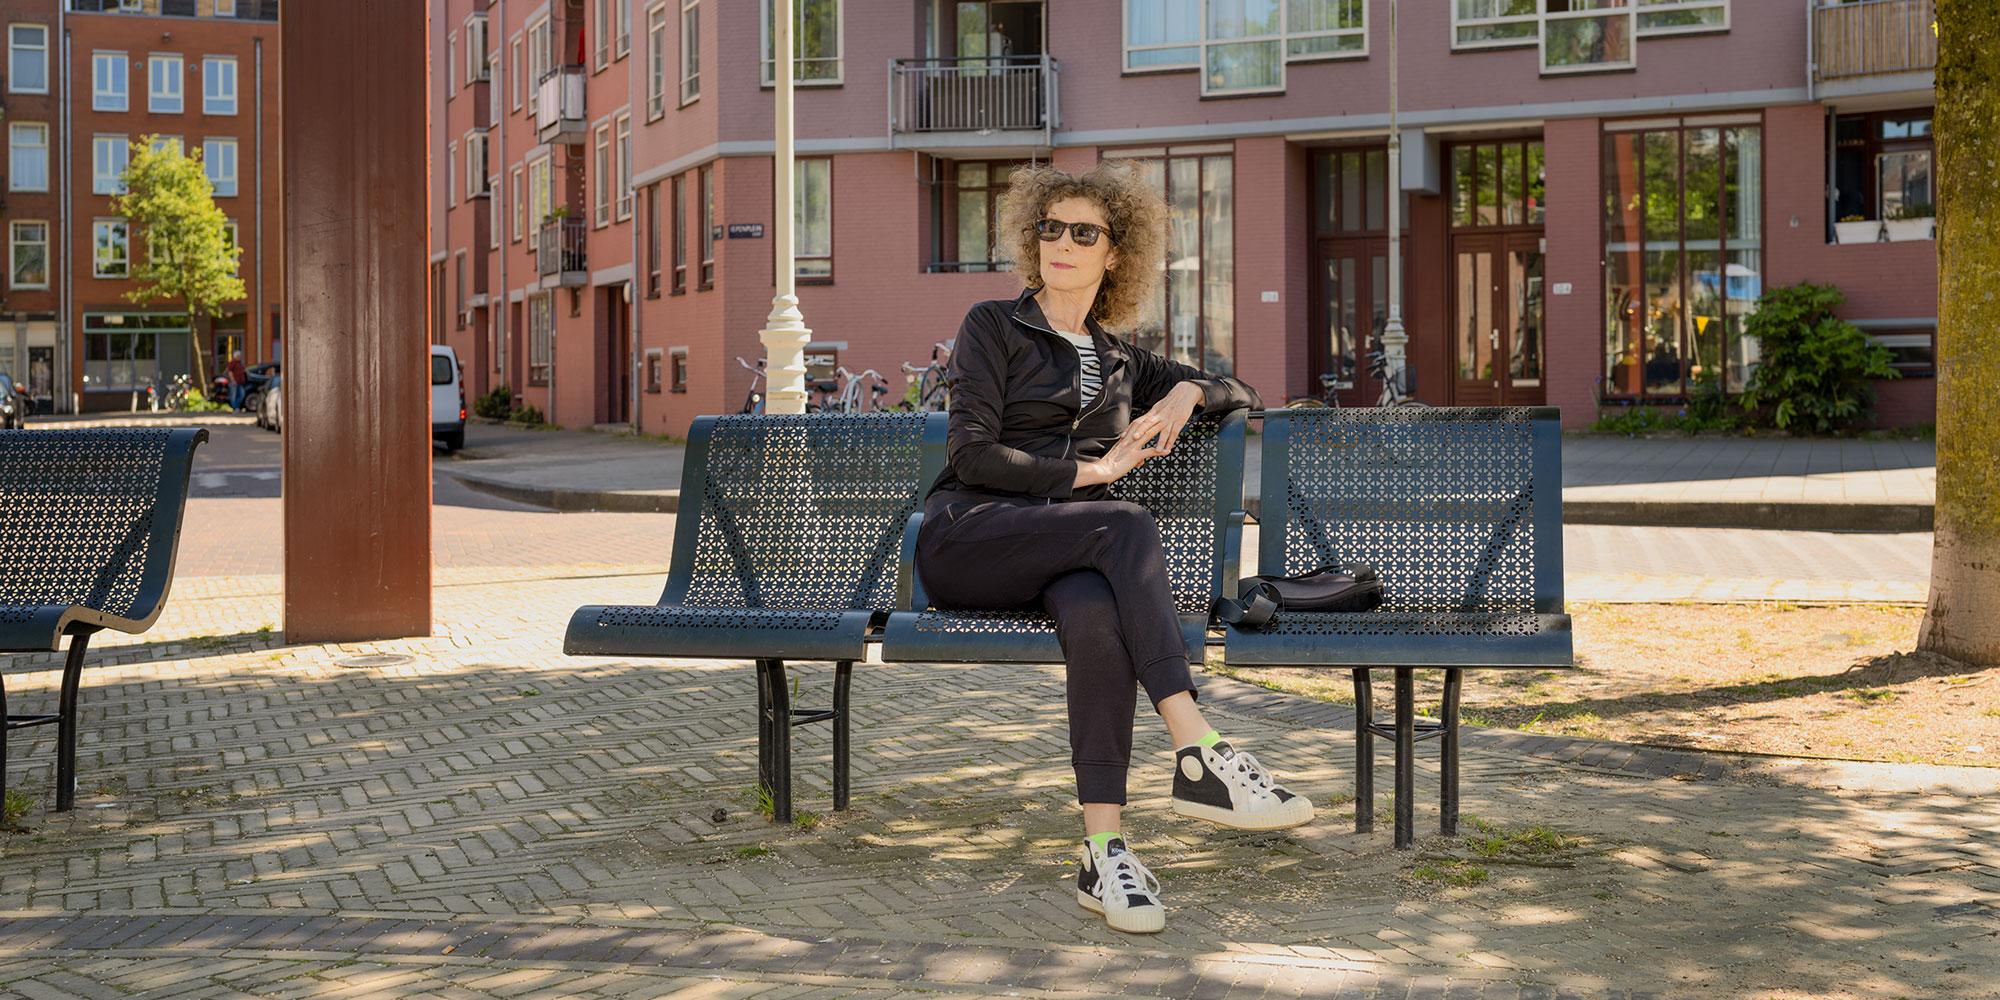 RESILIO | Buurtbewoner Olga